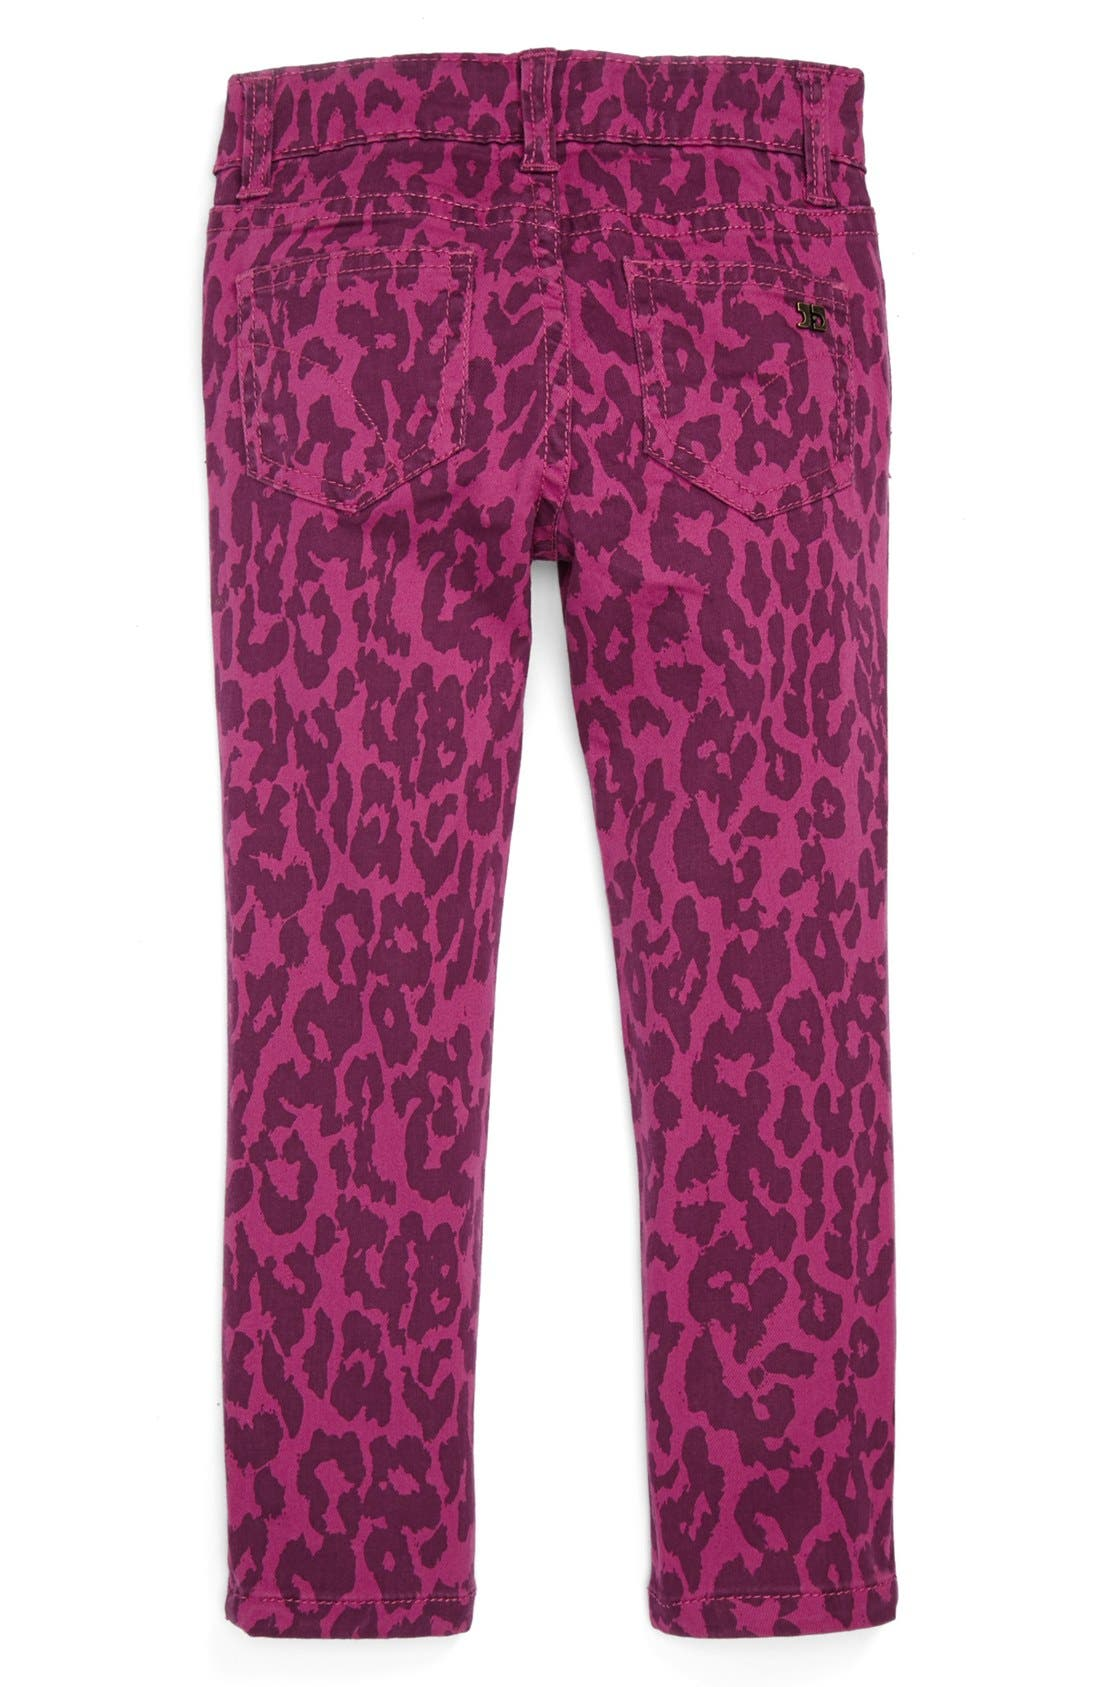 Alternate Image 1 Selected - Joe's 'Wild Leopard' Jeggings (Toddler Girls)